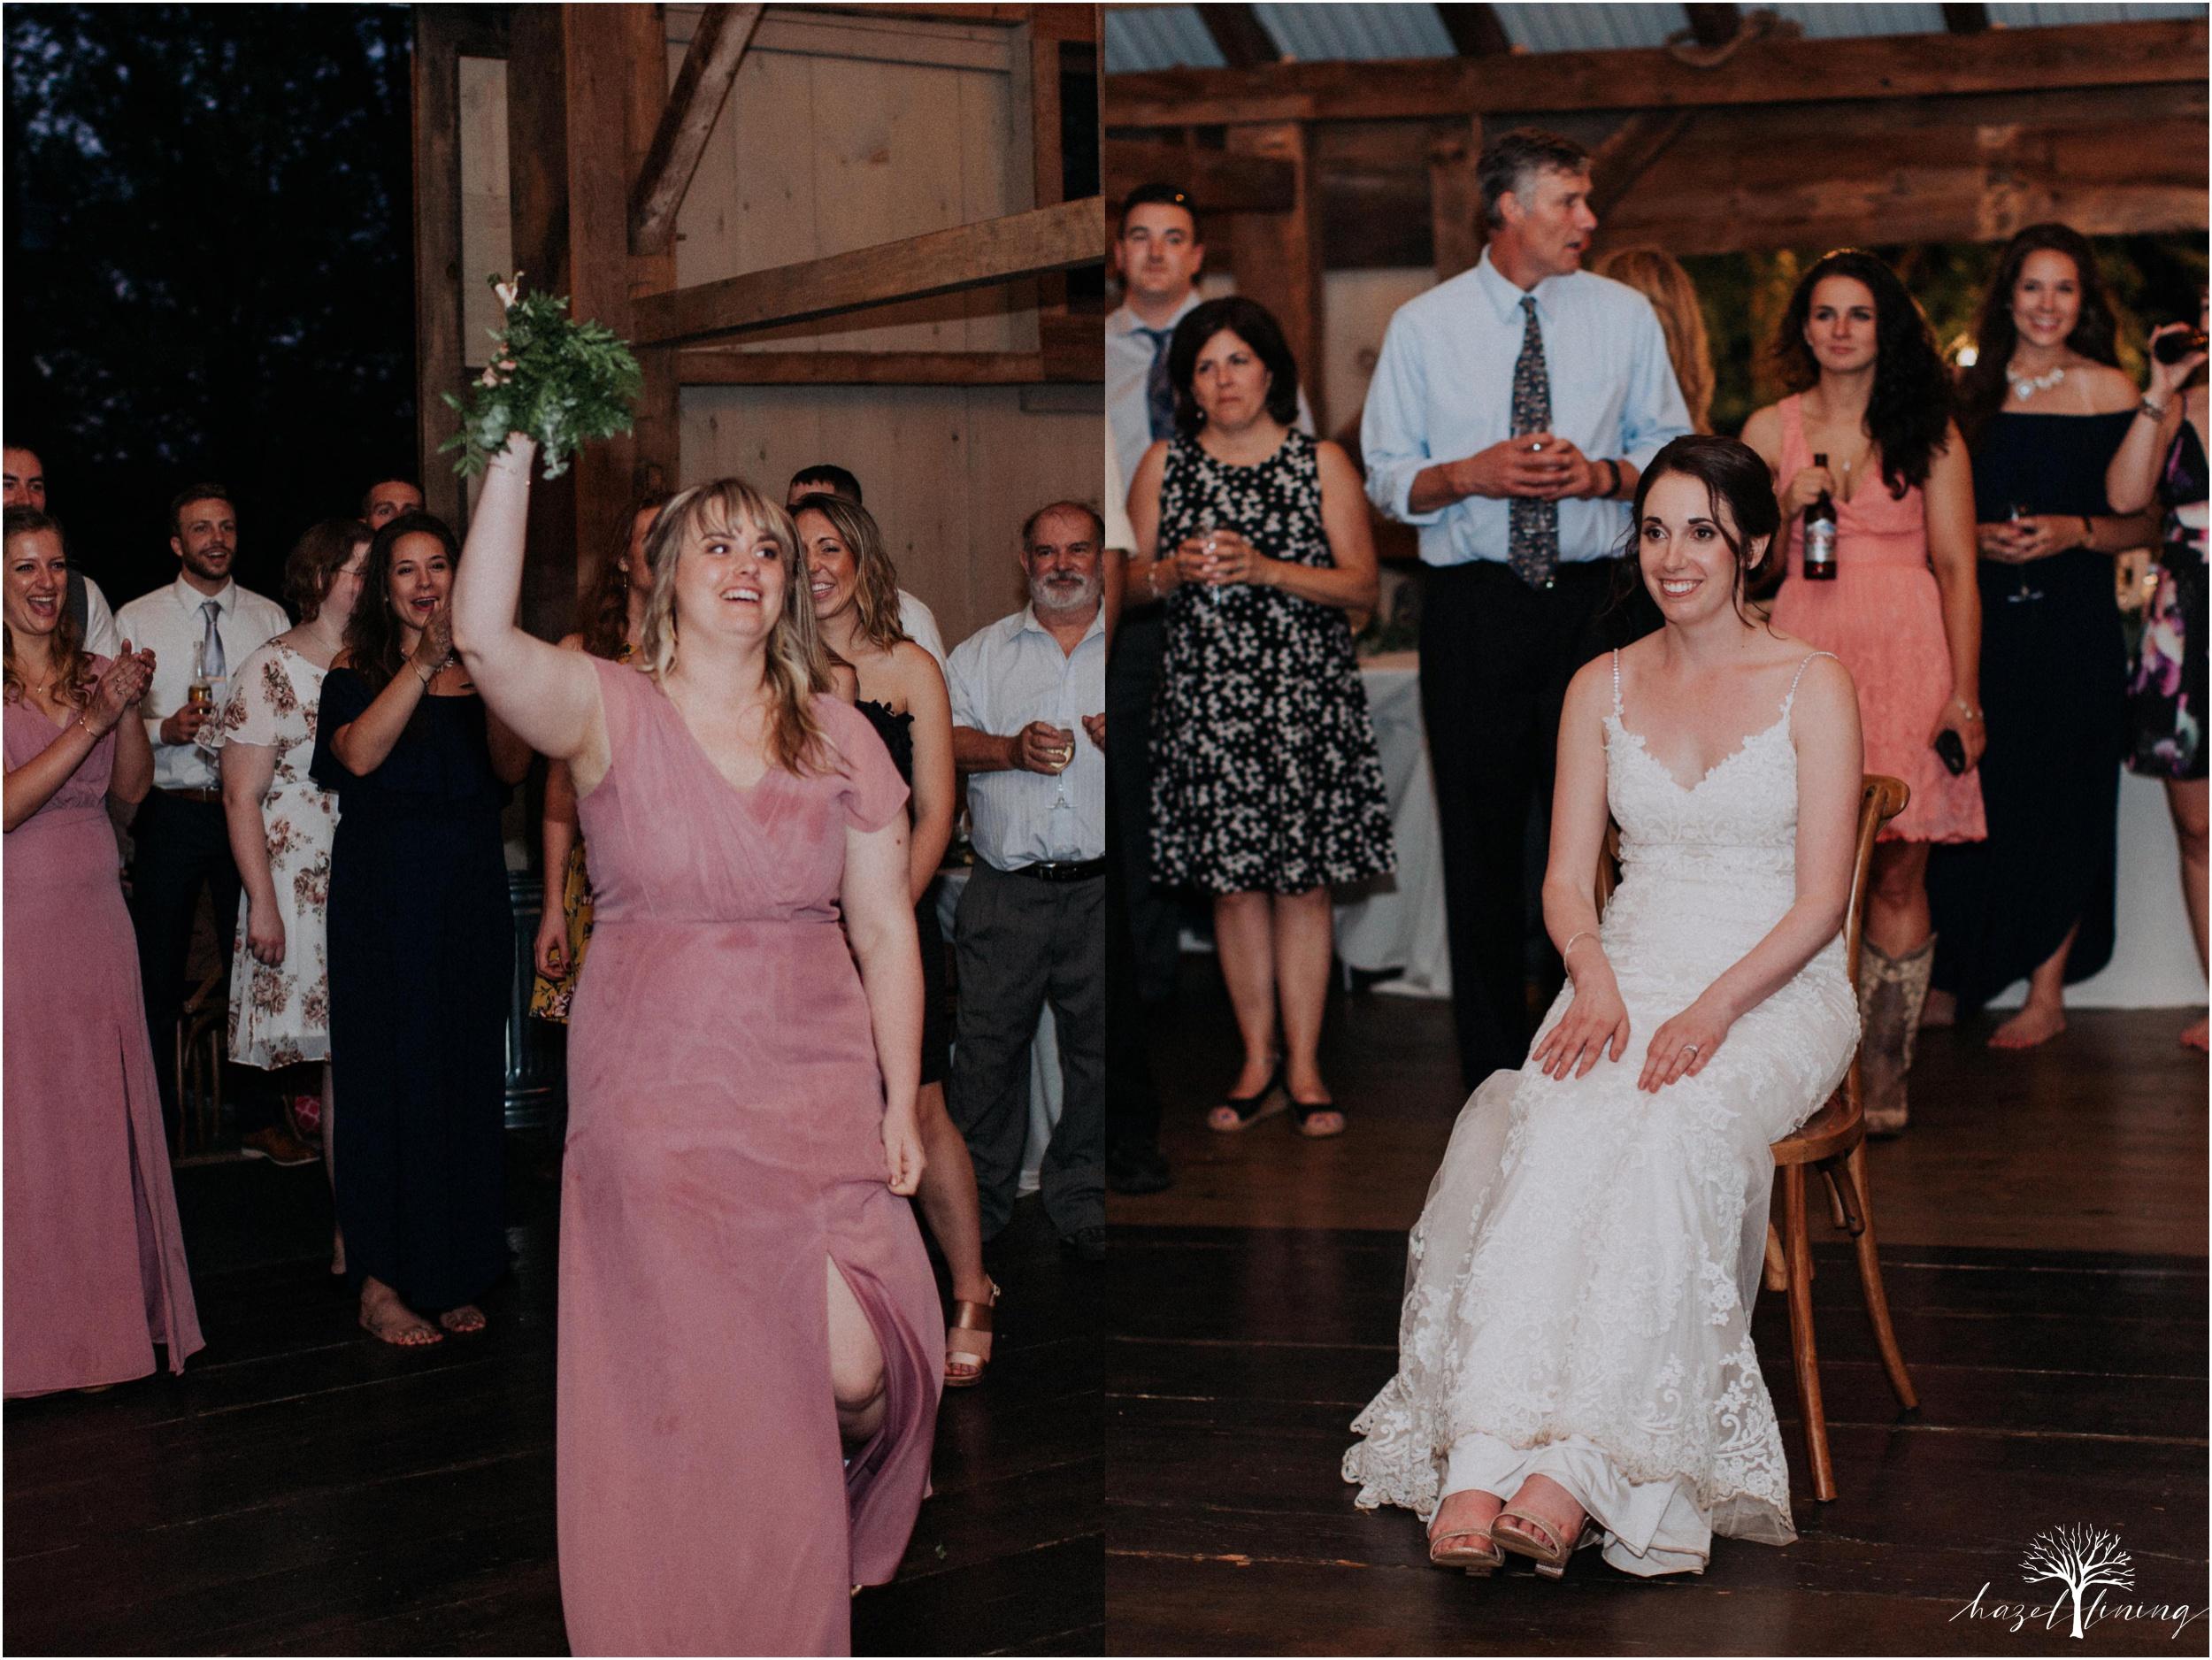 hazel-lining-travel-wedding-elopement-photography-lisa-landon-shoemaker-the-farm-bakery-and-events-bucks-county-quakertown-pennsylvania-summer-country-outdoor-farm-wedding_0164.jpg